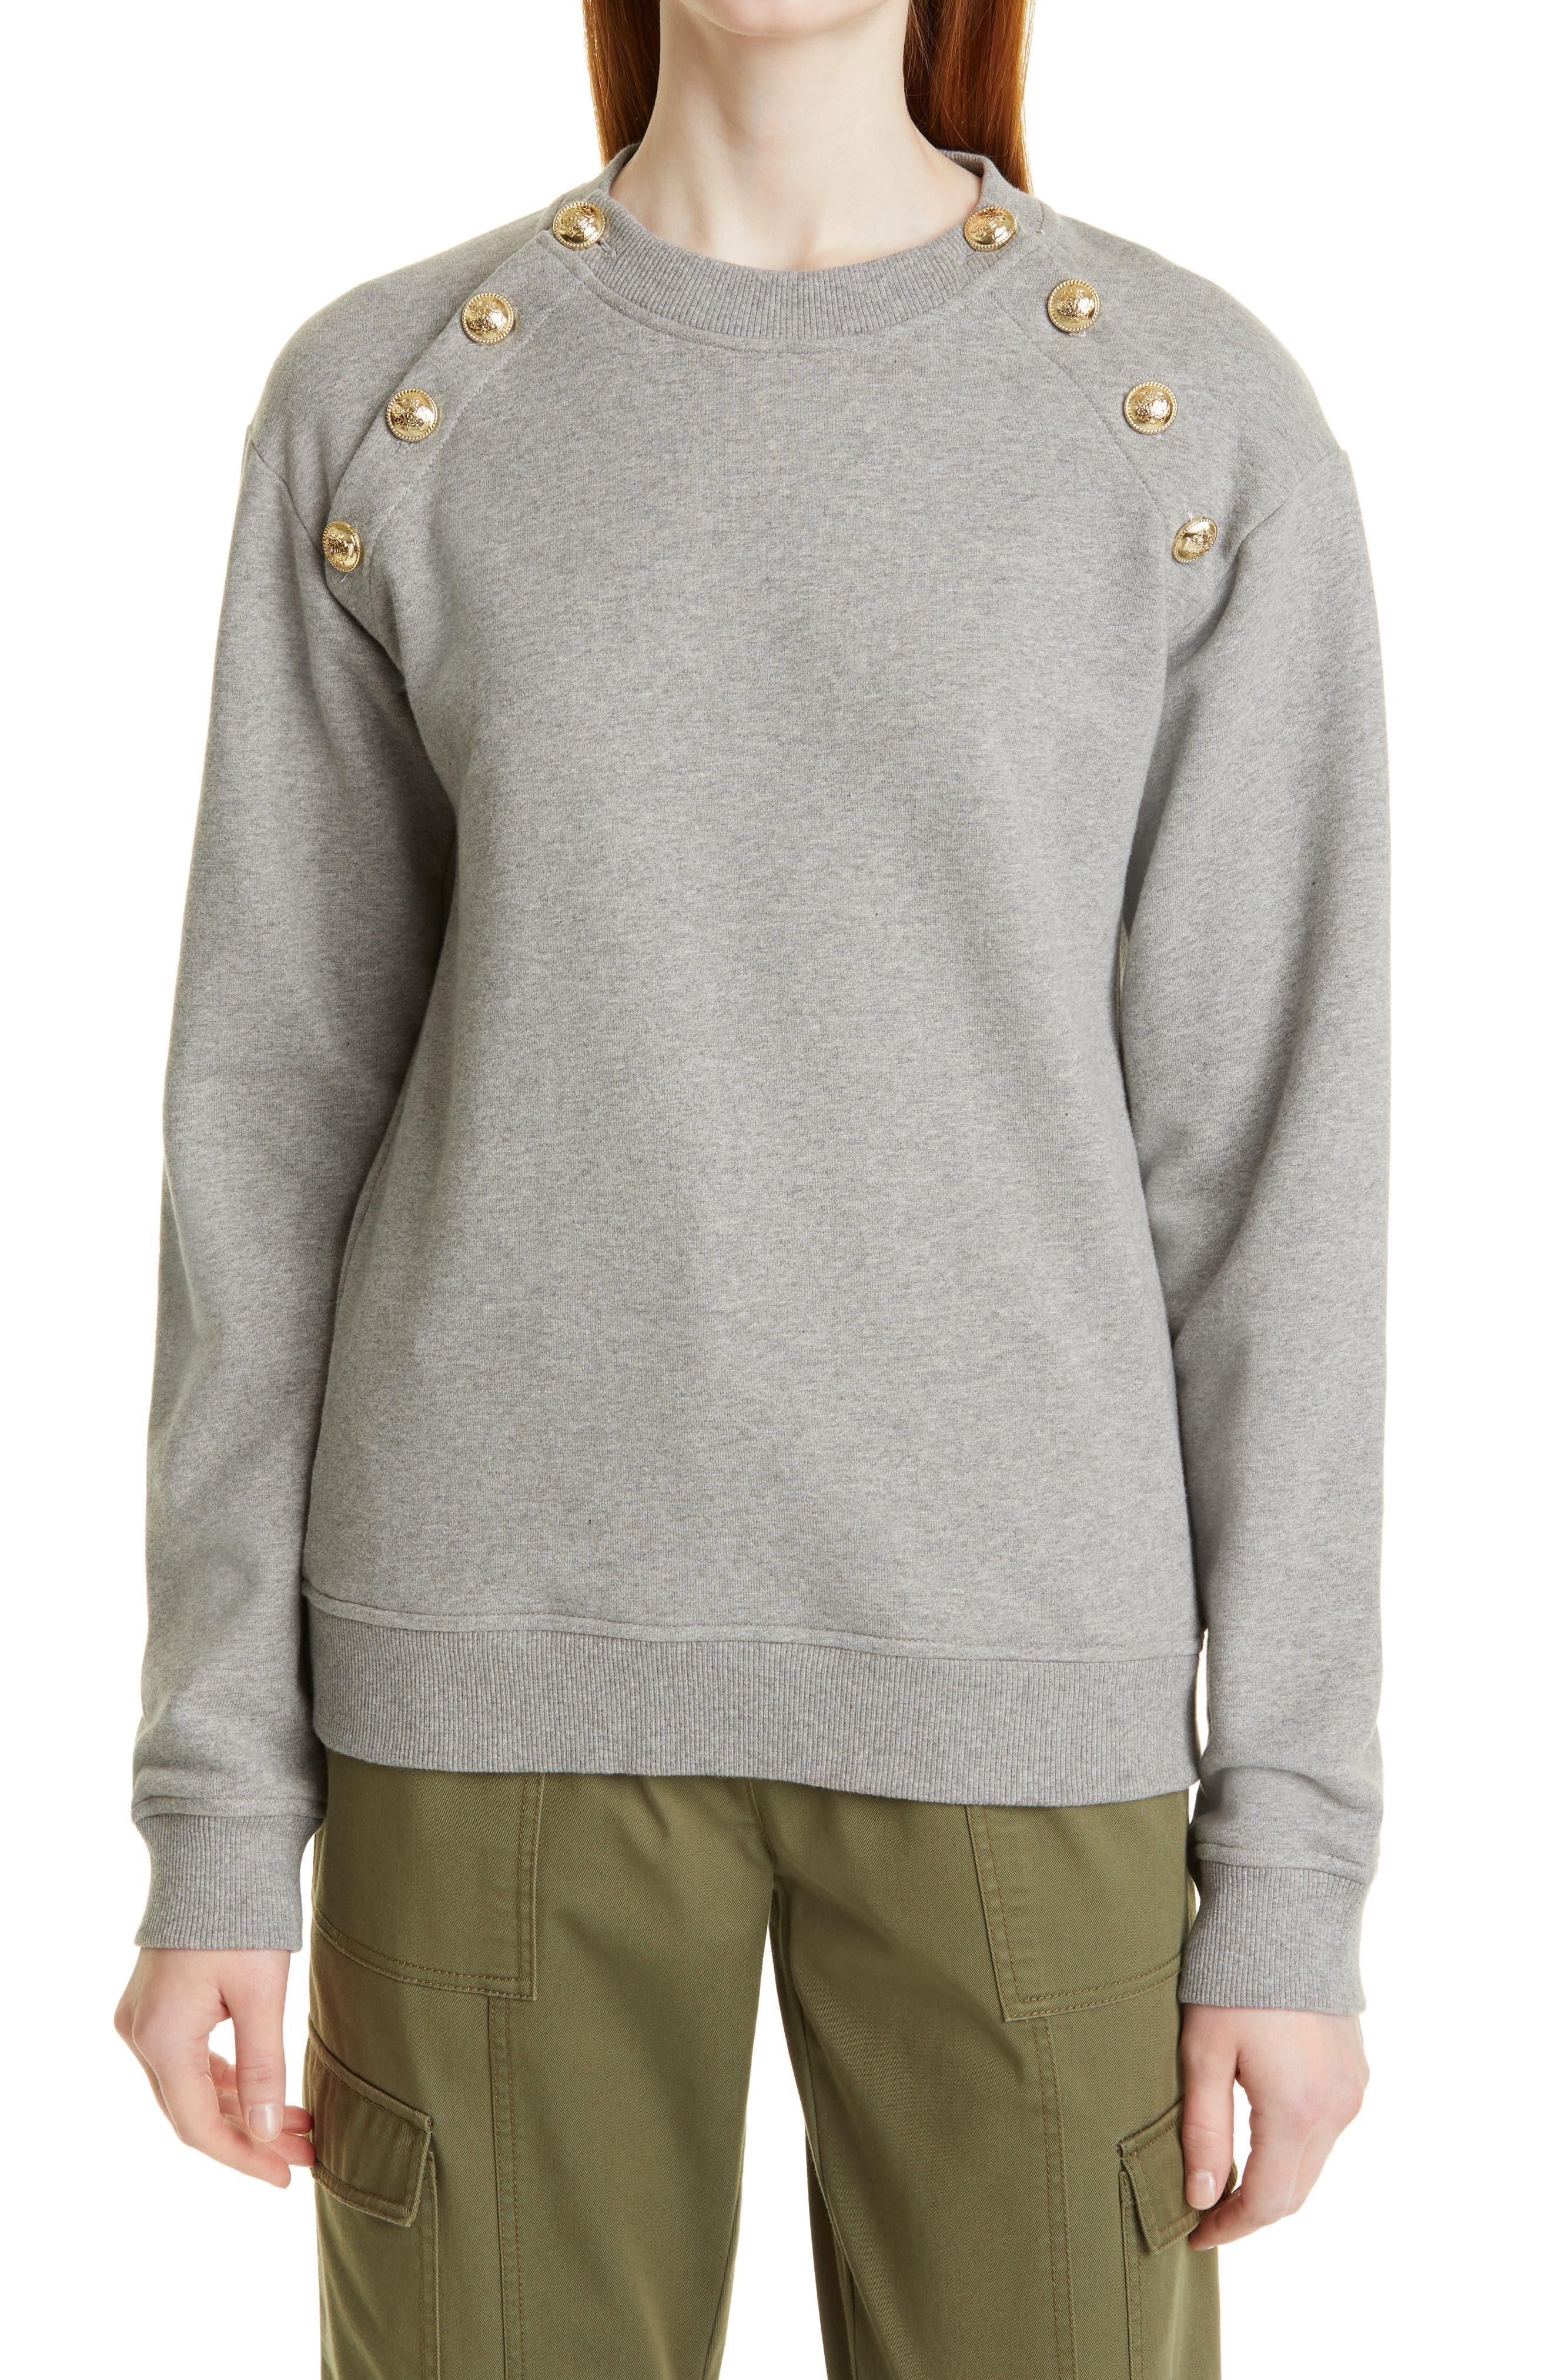 Sailor Button Cotton Sweatshirt